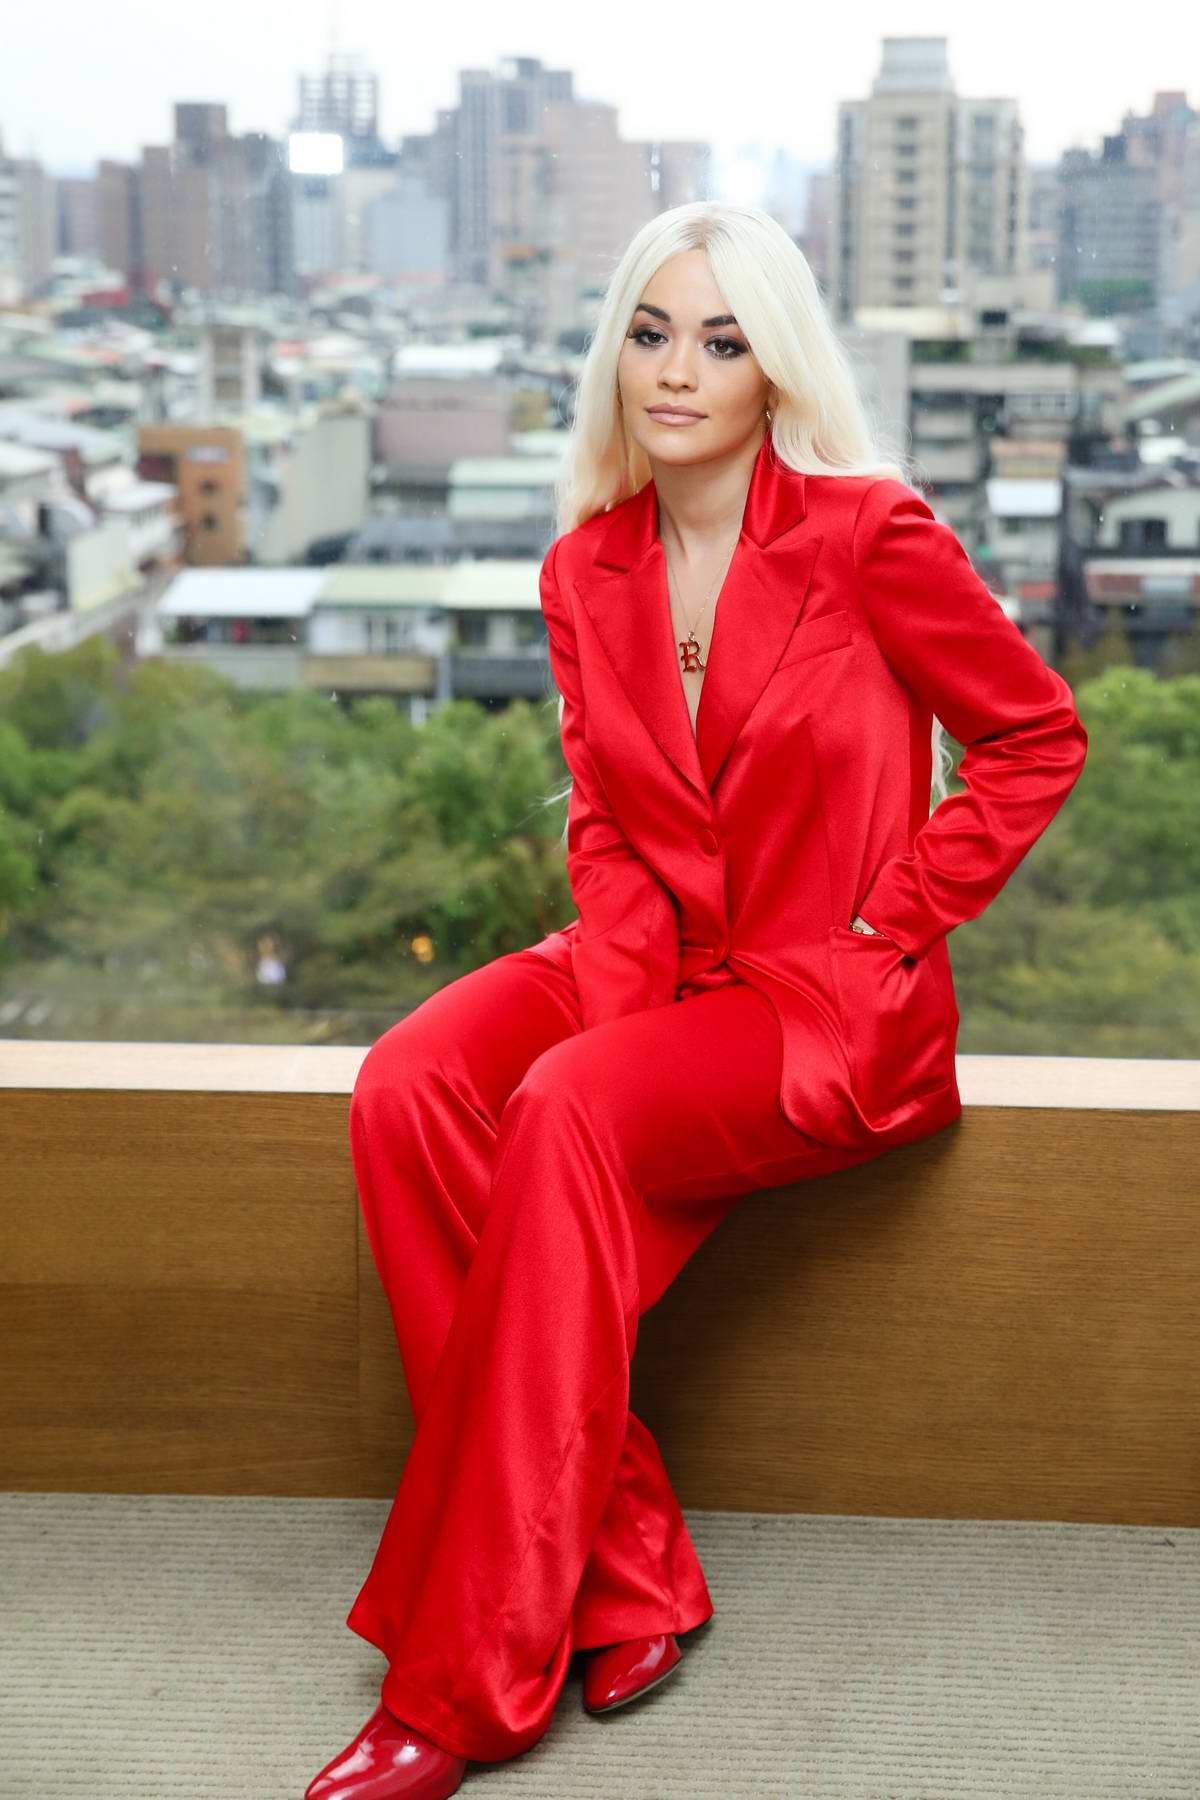 Rita Ora rocks bright red ensemble during an interview before the Rita Ora Phoenix 2019 Live concert in Taipei, Taiwan